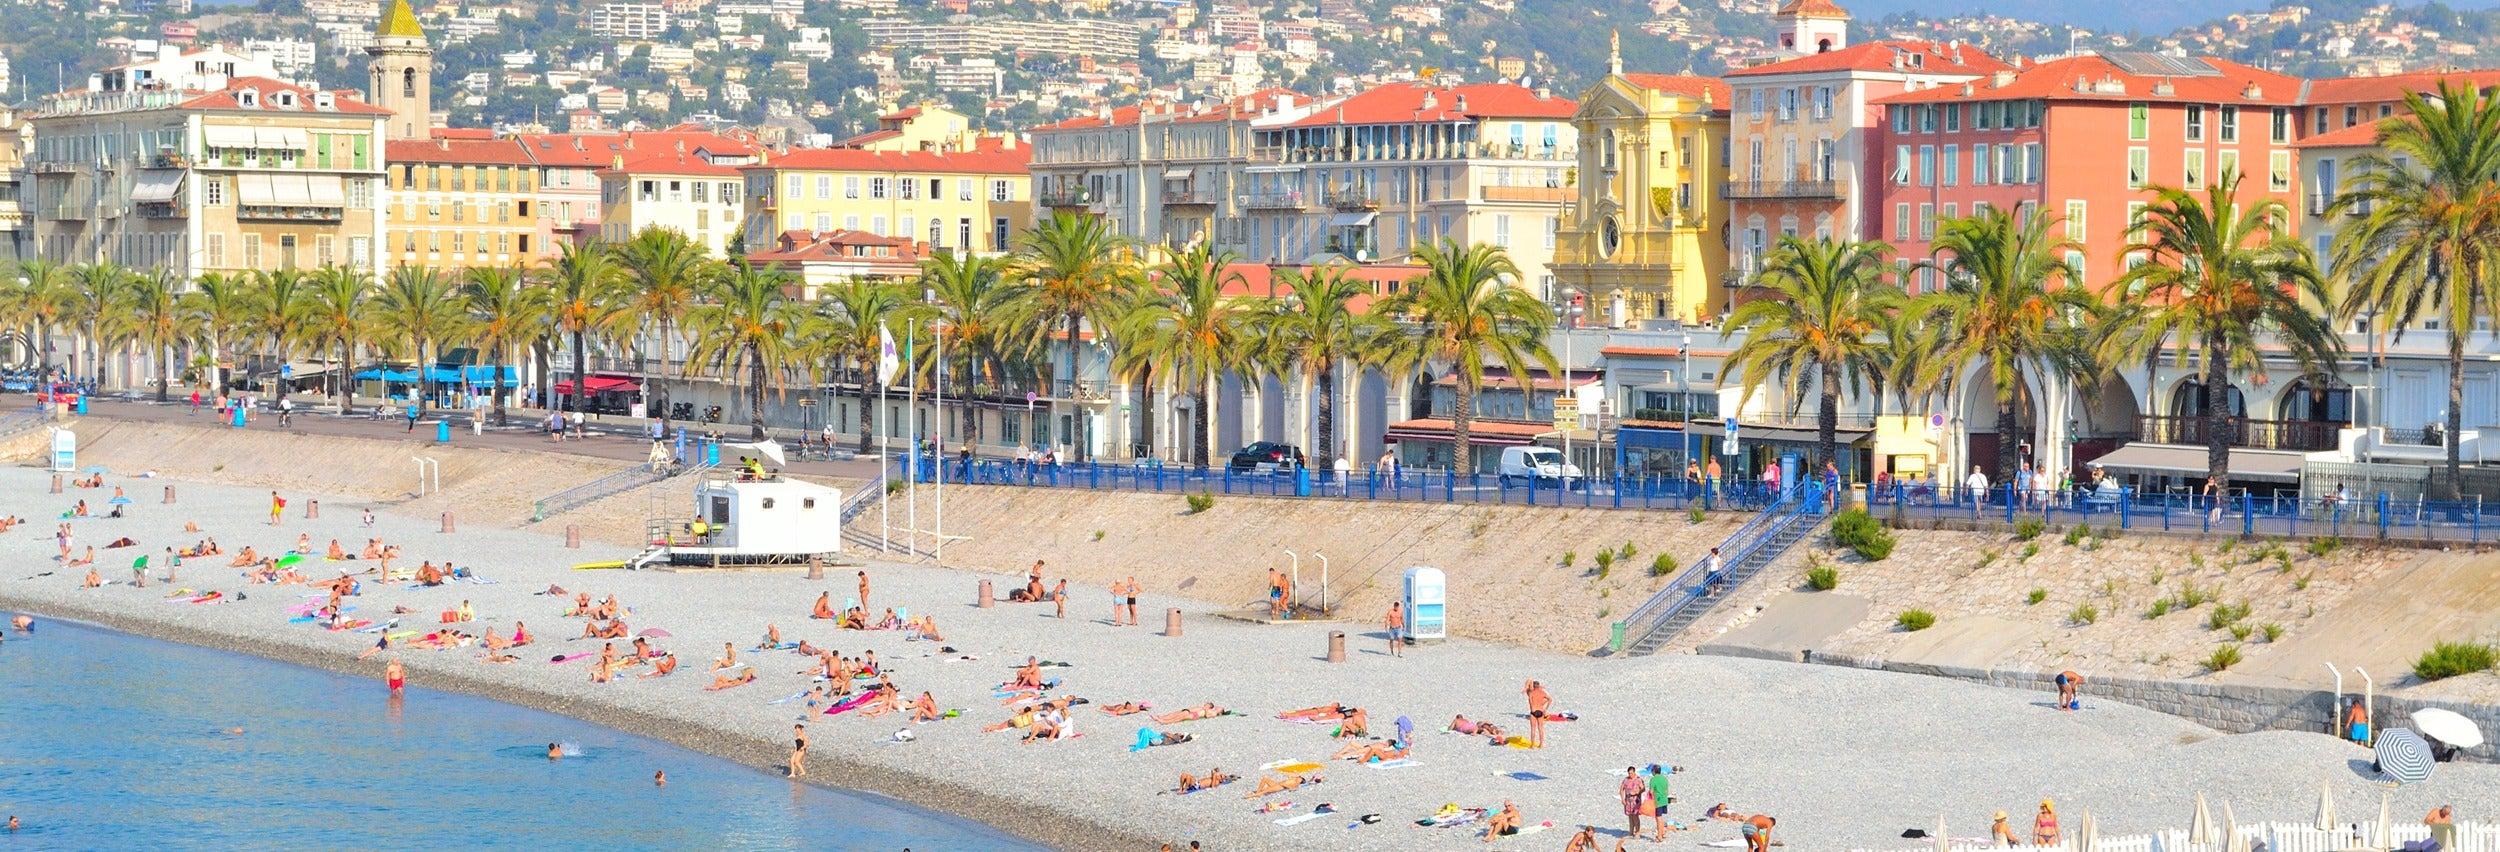 Visite panoramique dans Nice